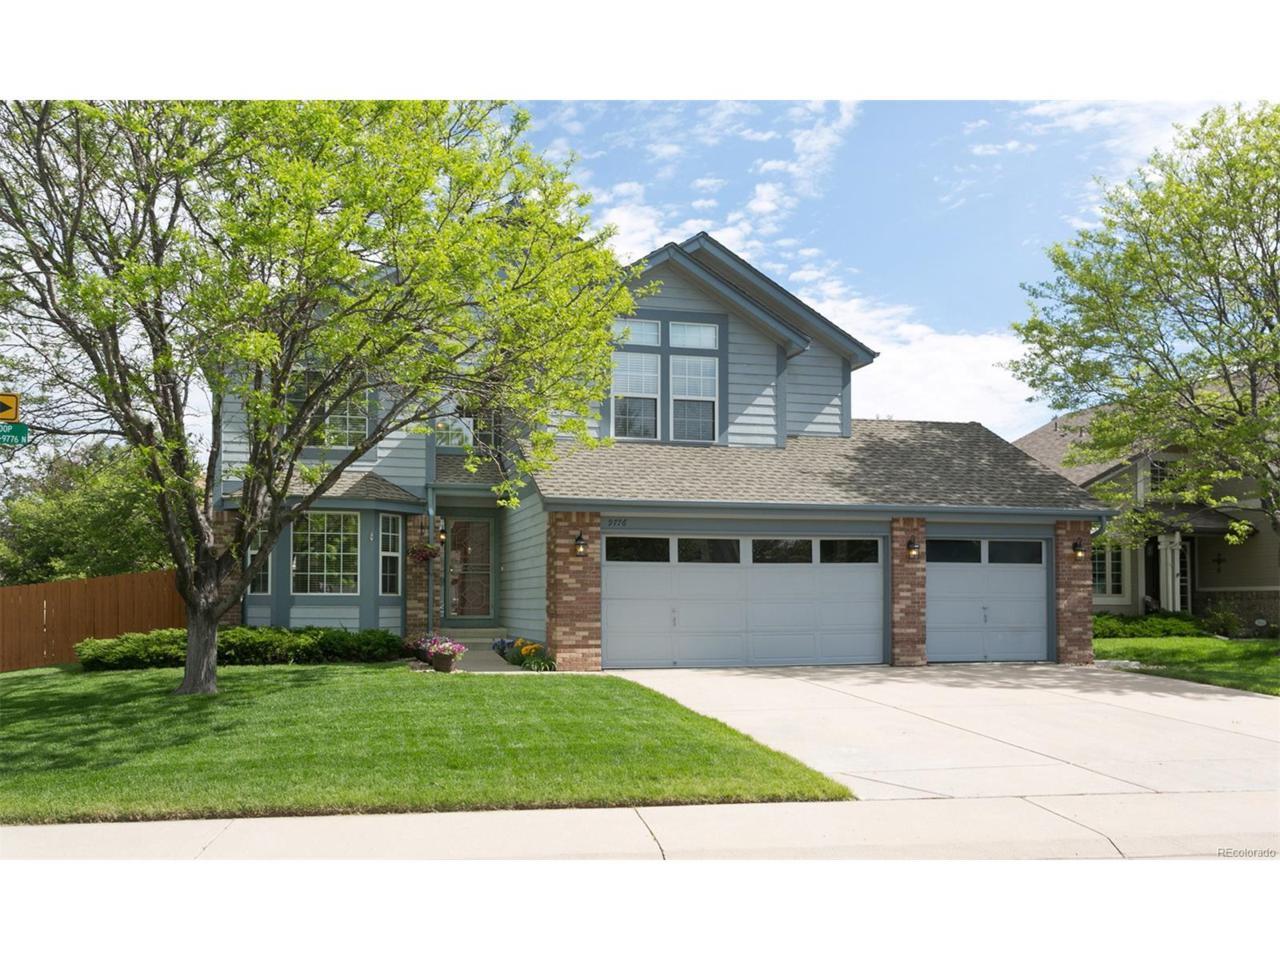 9776 Quay Loop, Westminster, CO 80021 (MLS #7148220) :: 8z Real Estate